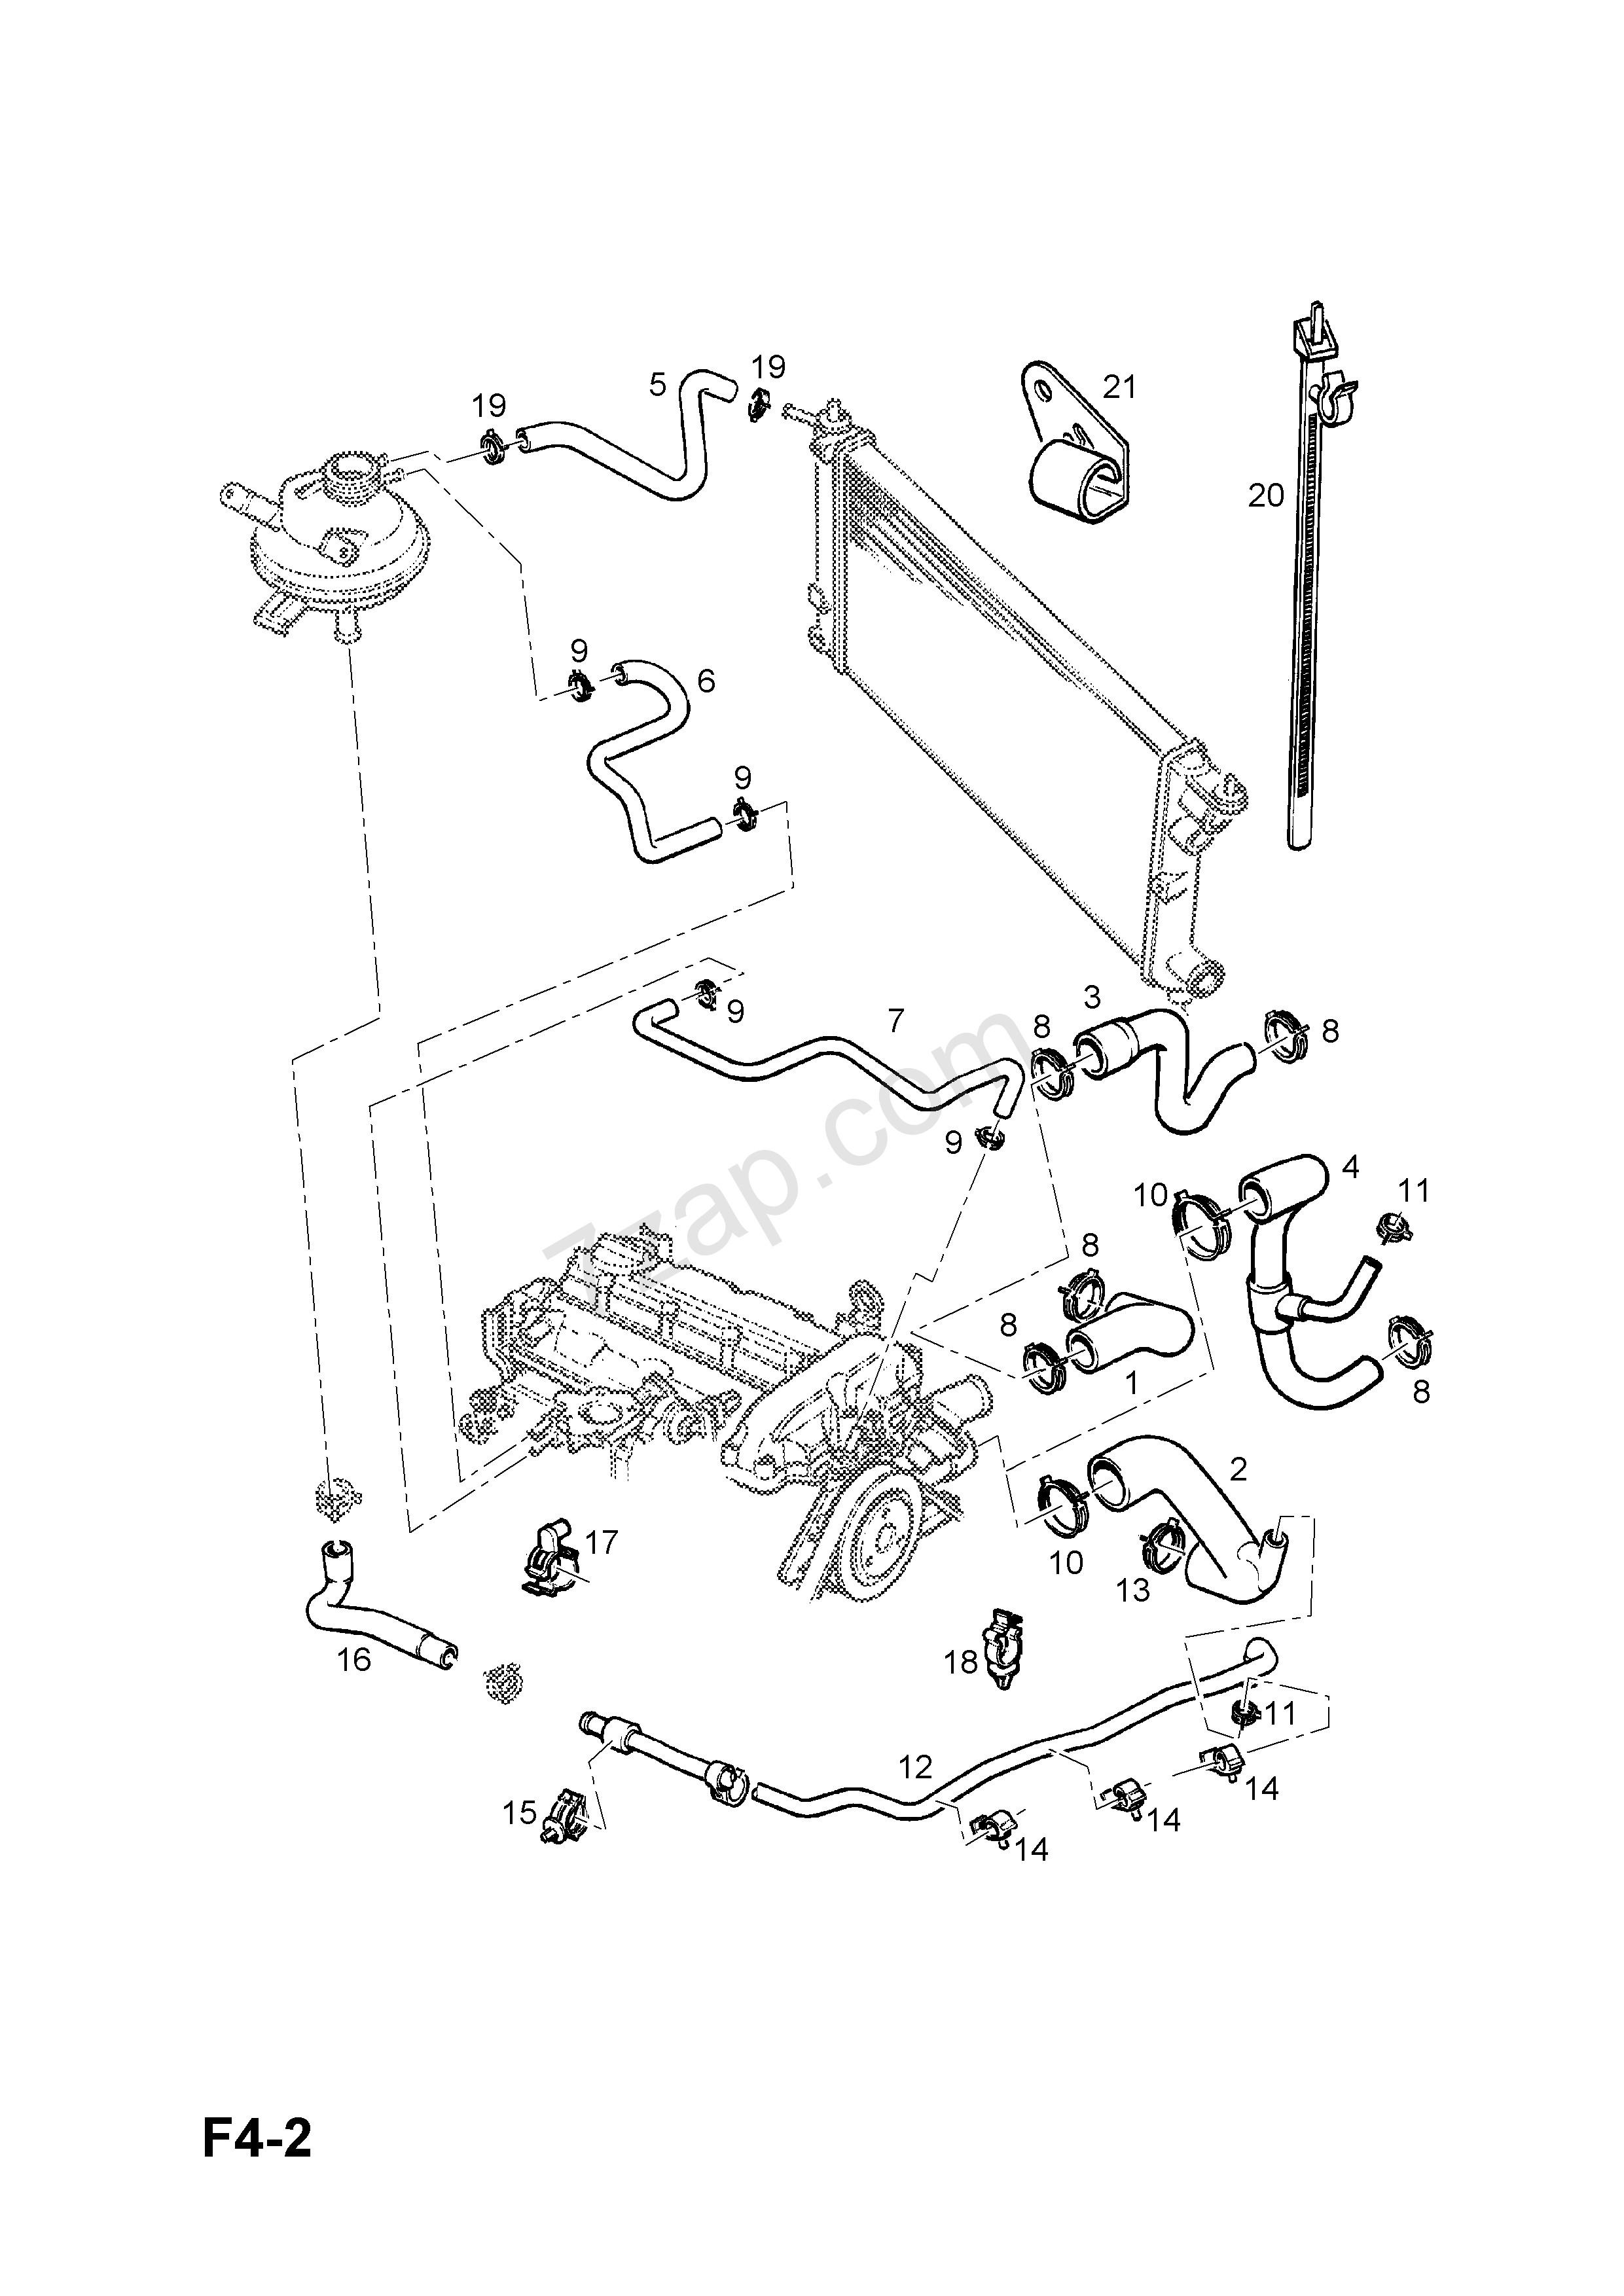 vauxhall corsa 1 2 engine diagram 2 my wiring diagram